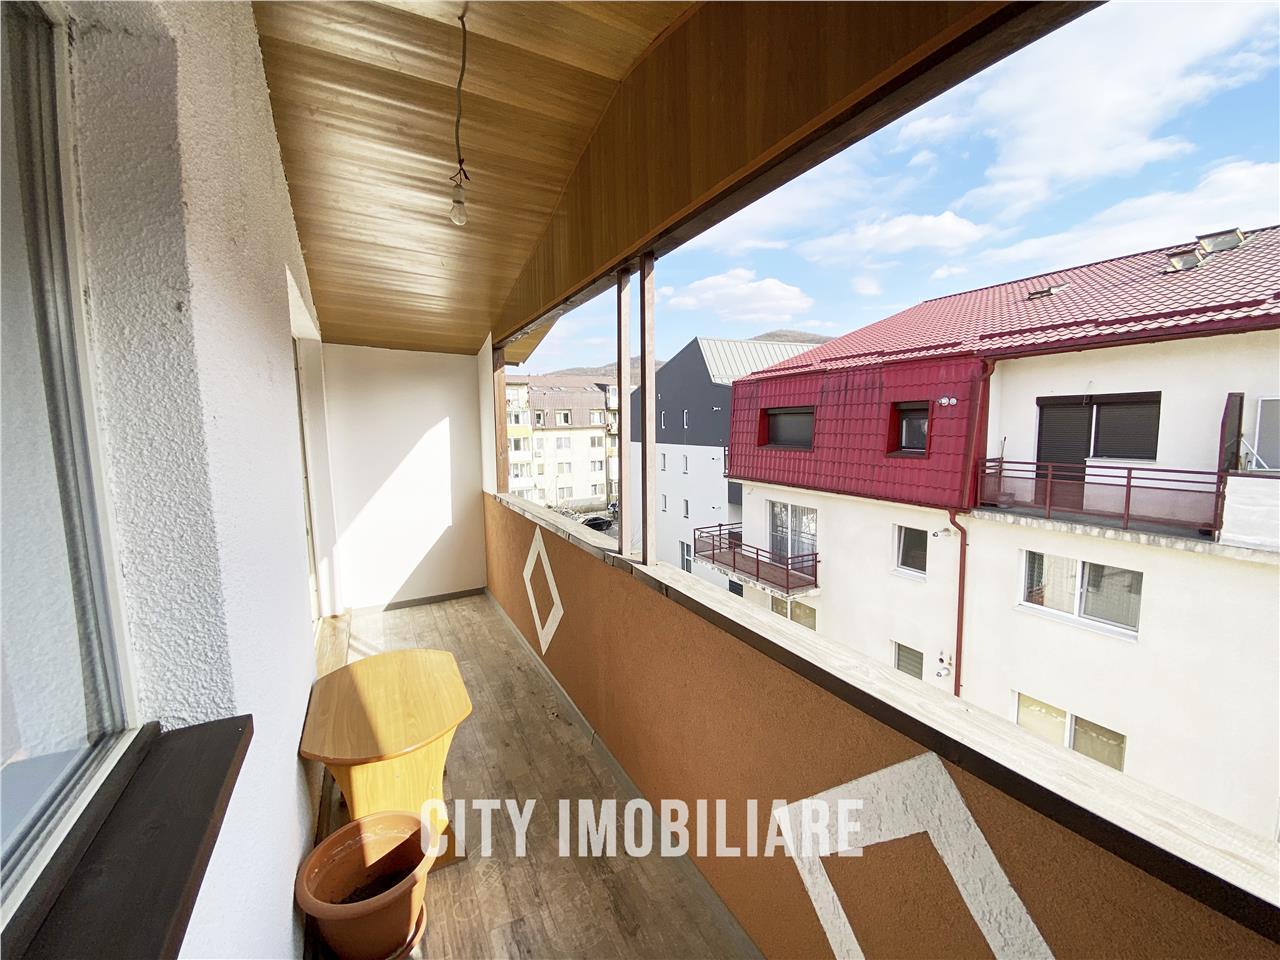 Apartament cu 3 camere  S:84mp+ 7mp balcon, Florilor. Comosion 0